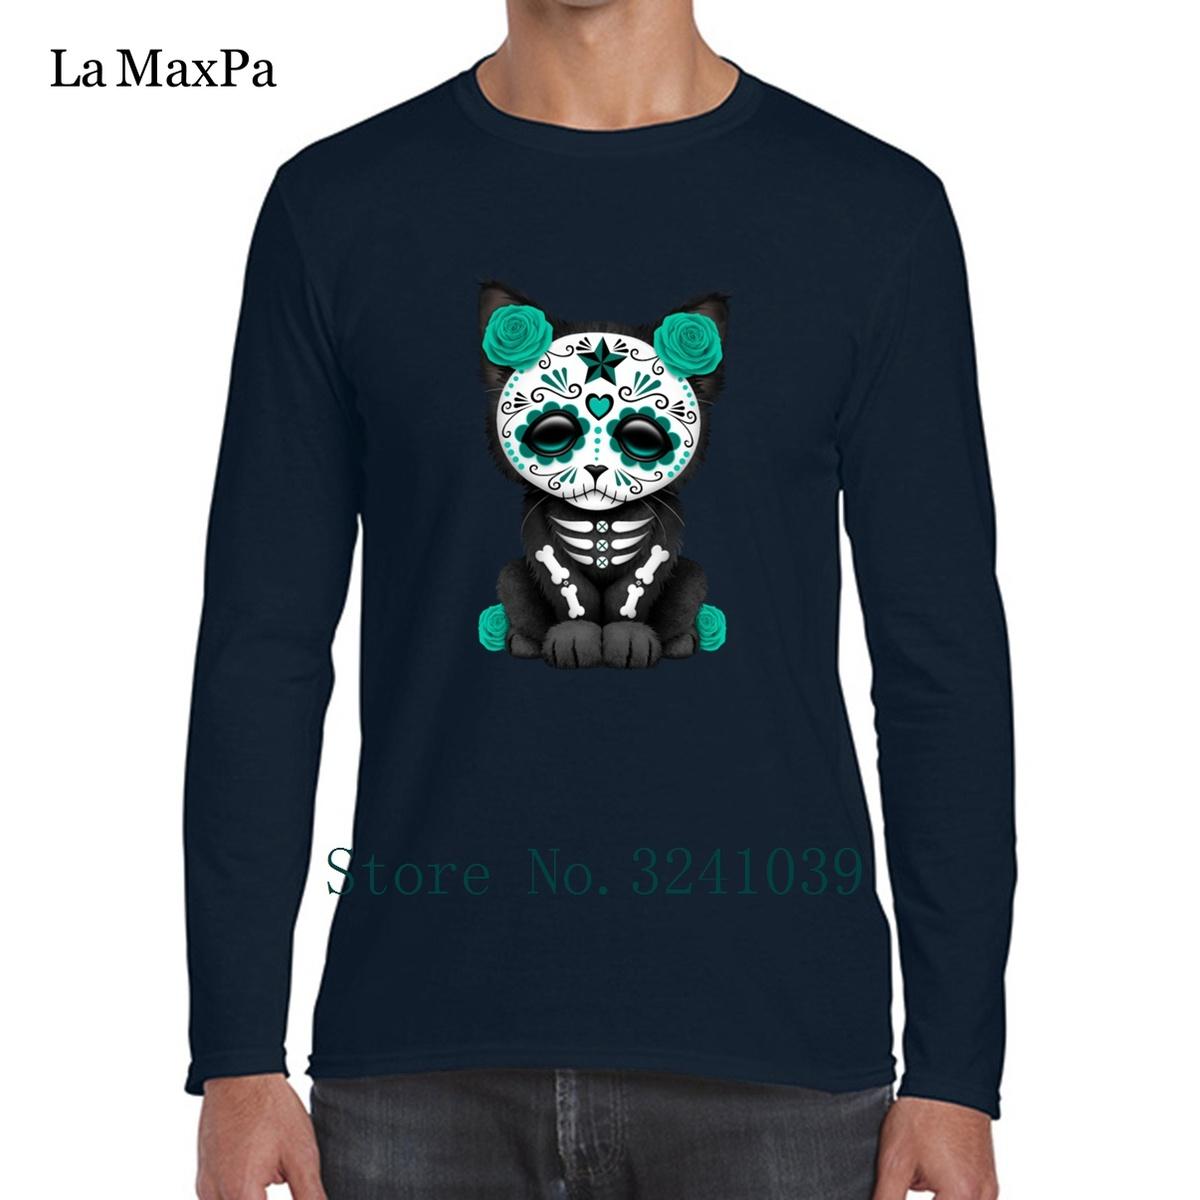 La Maxpa Blue Sugar Skull Kitten Novelty Men's Tee Shirts 2018 T-Shirt For Men Homme S-3xl T Shirt Mens Hiphop Tops